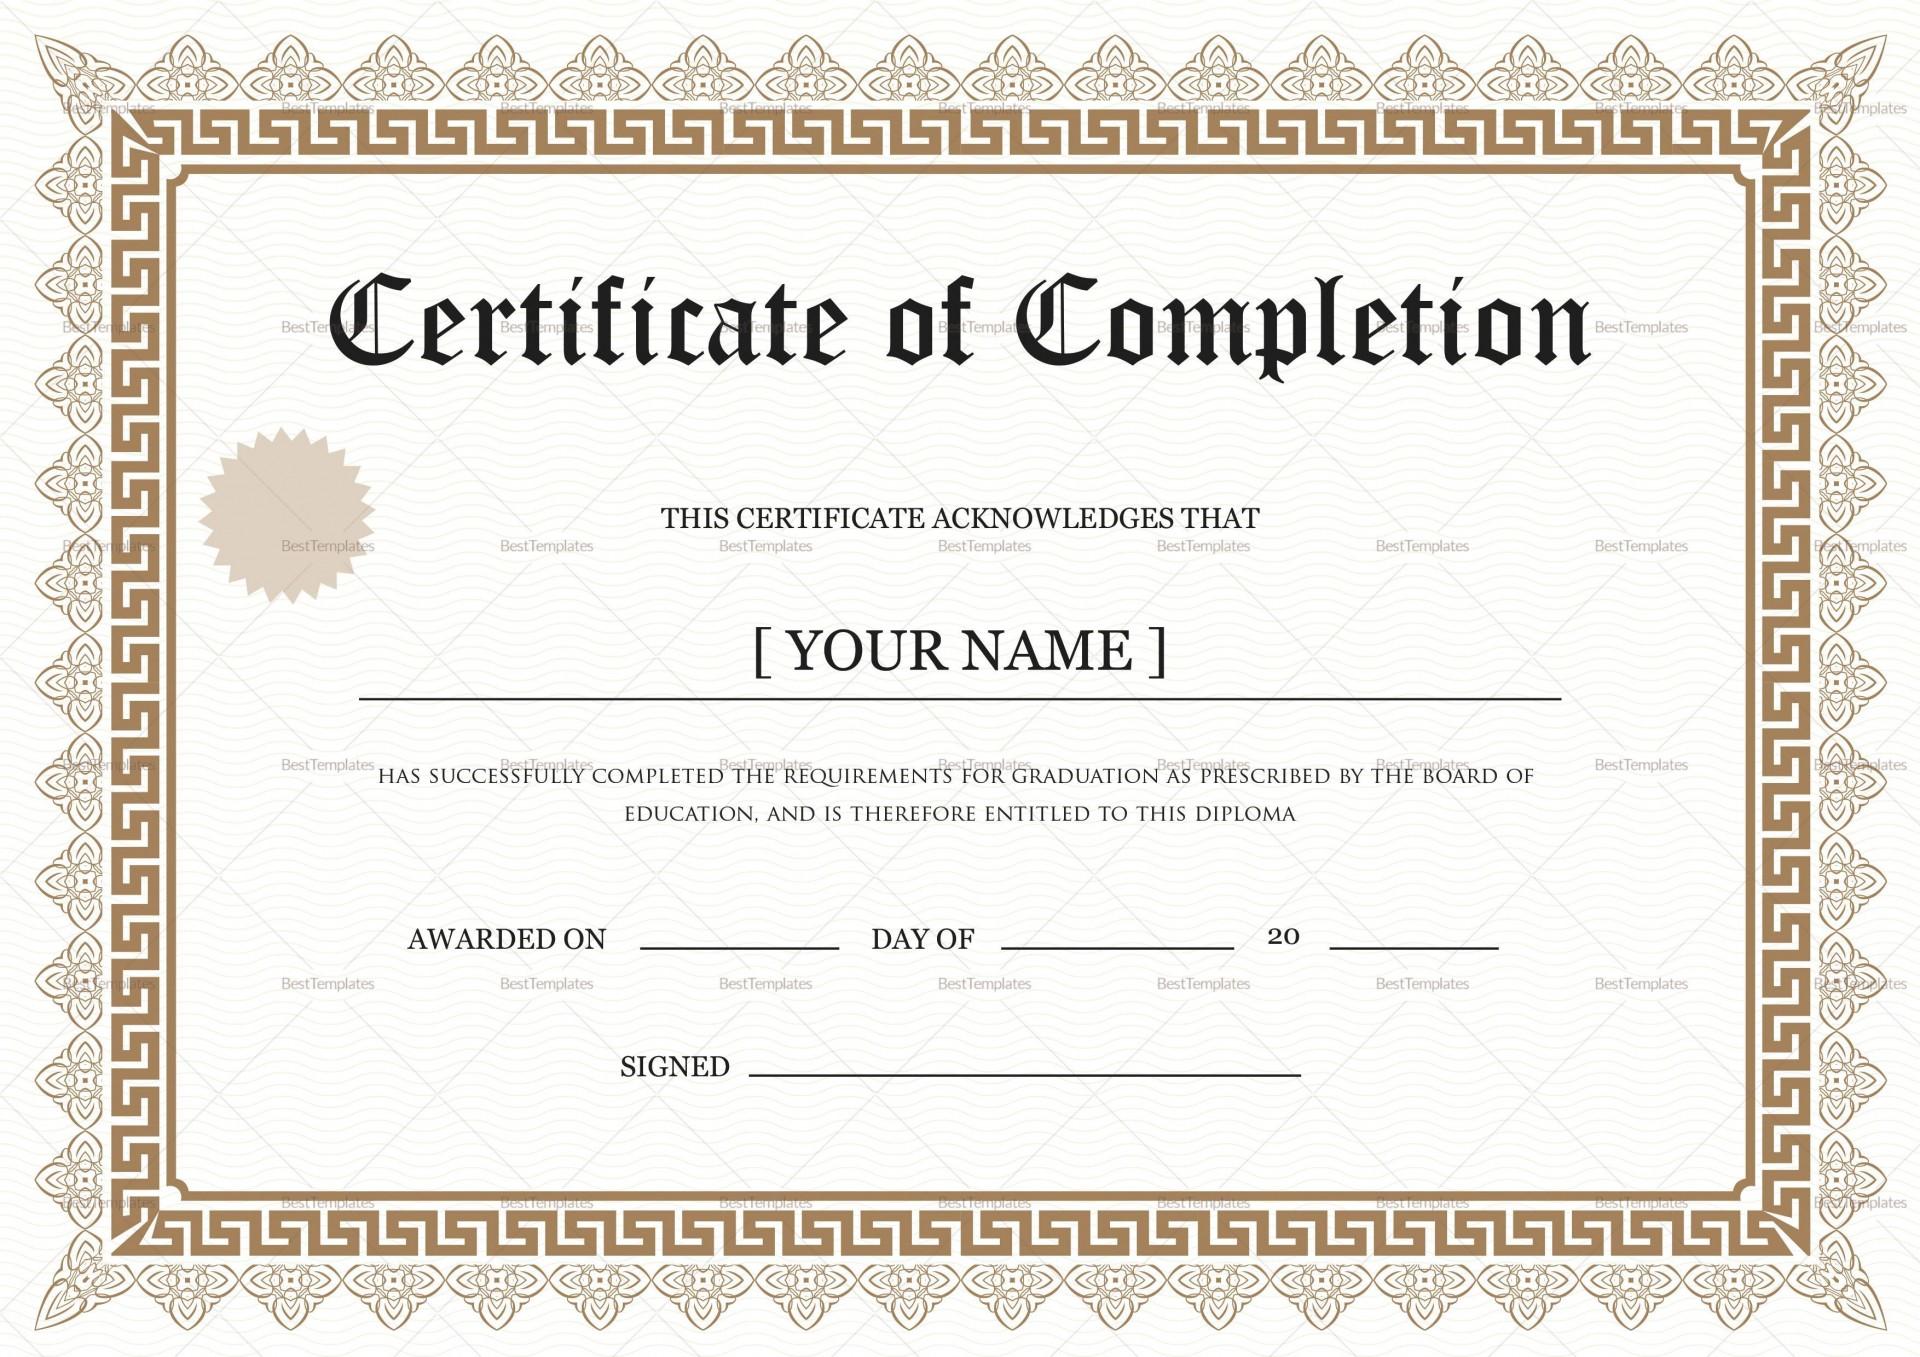 001 Wonderful Degree Certificate Template Word Photo 1920